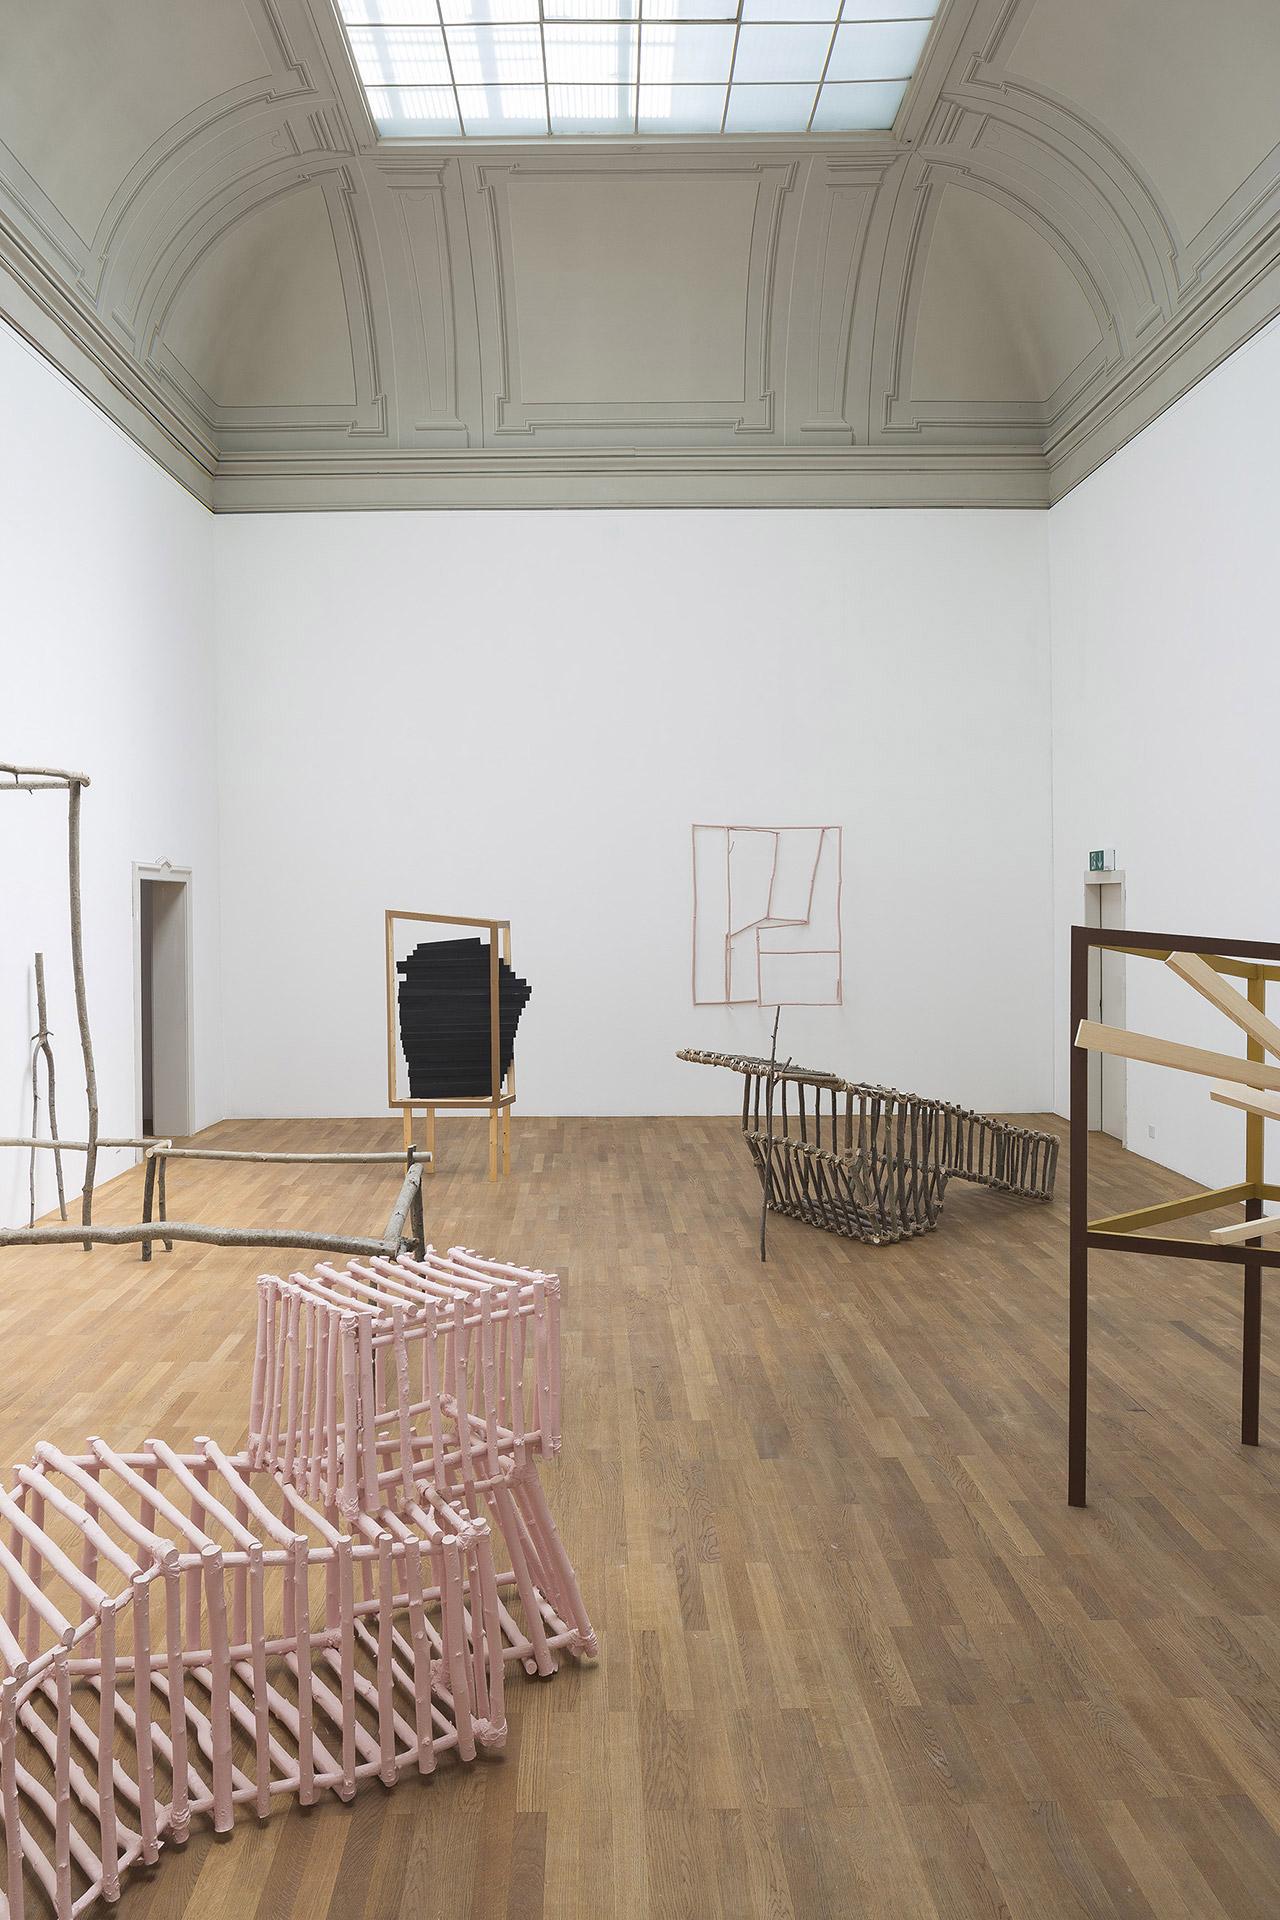 Gianin-Conrad-Kunsthalle-Winterthur-2015-2.jpg